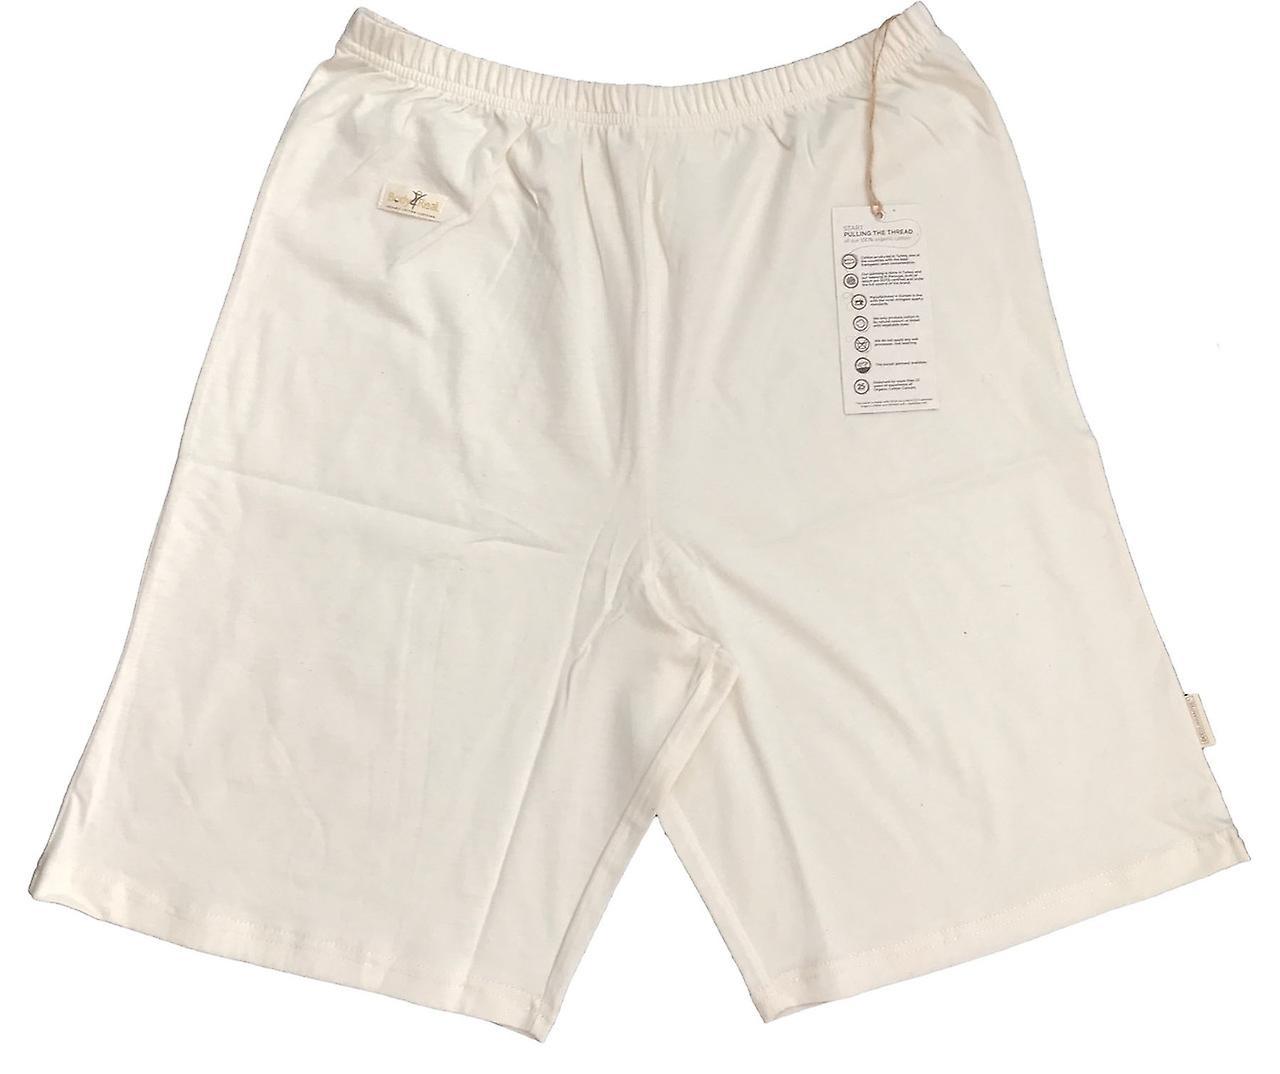 Body4real Organic Clothing 100% Certified Cotton Men's Short Pyjamas Extra Large